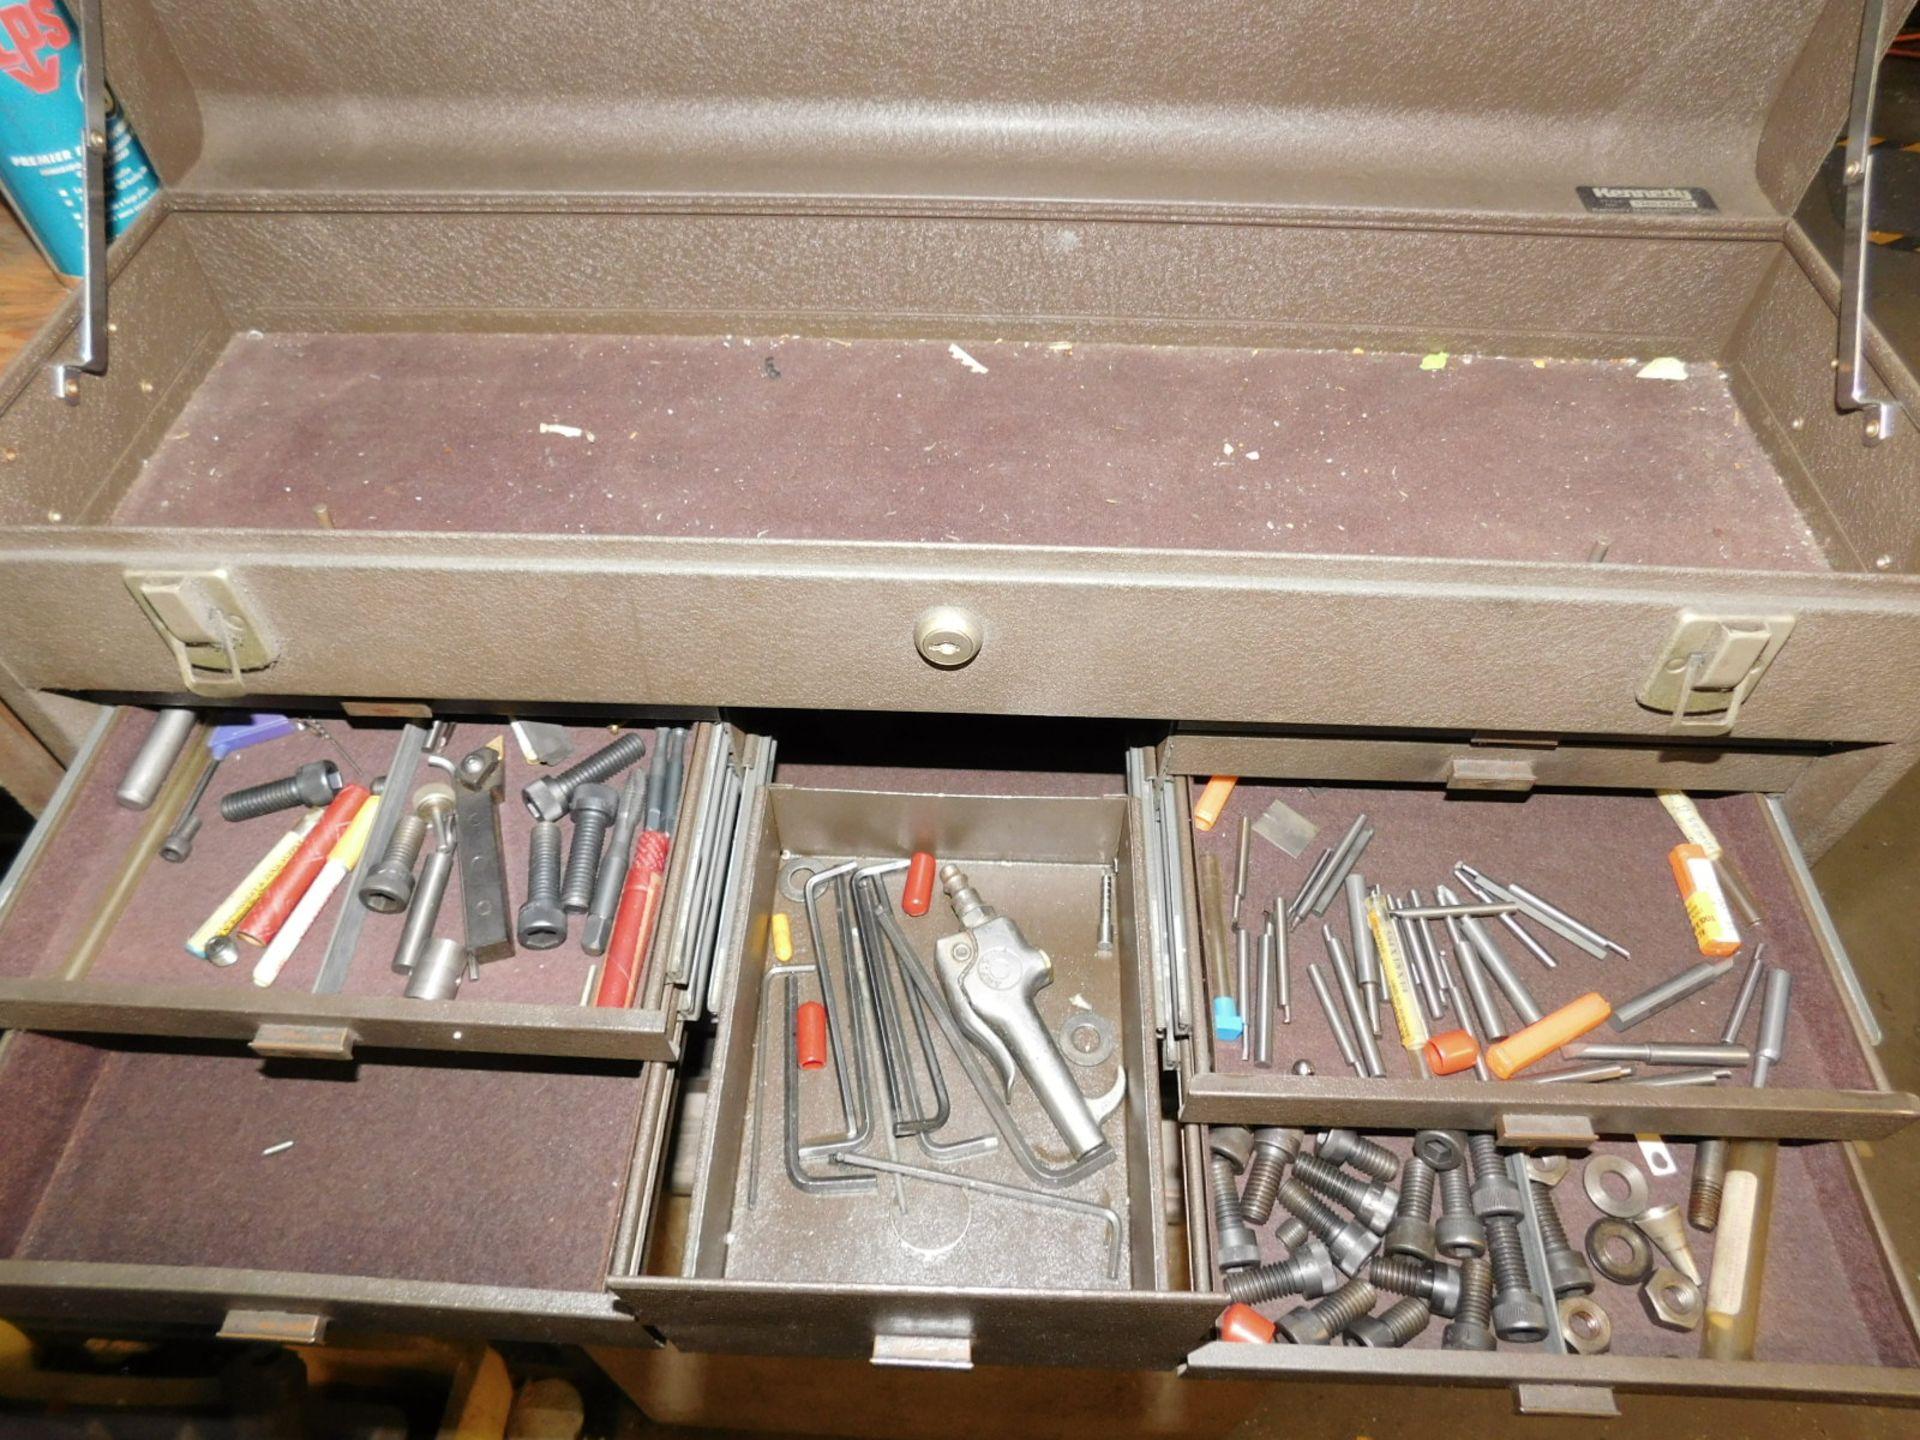 KENNEDY TOOL BOX, STYLE NO. 52611-627438, EMPTY, NEEDS NEW LOCK - Image 3 of 5